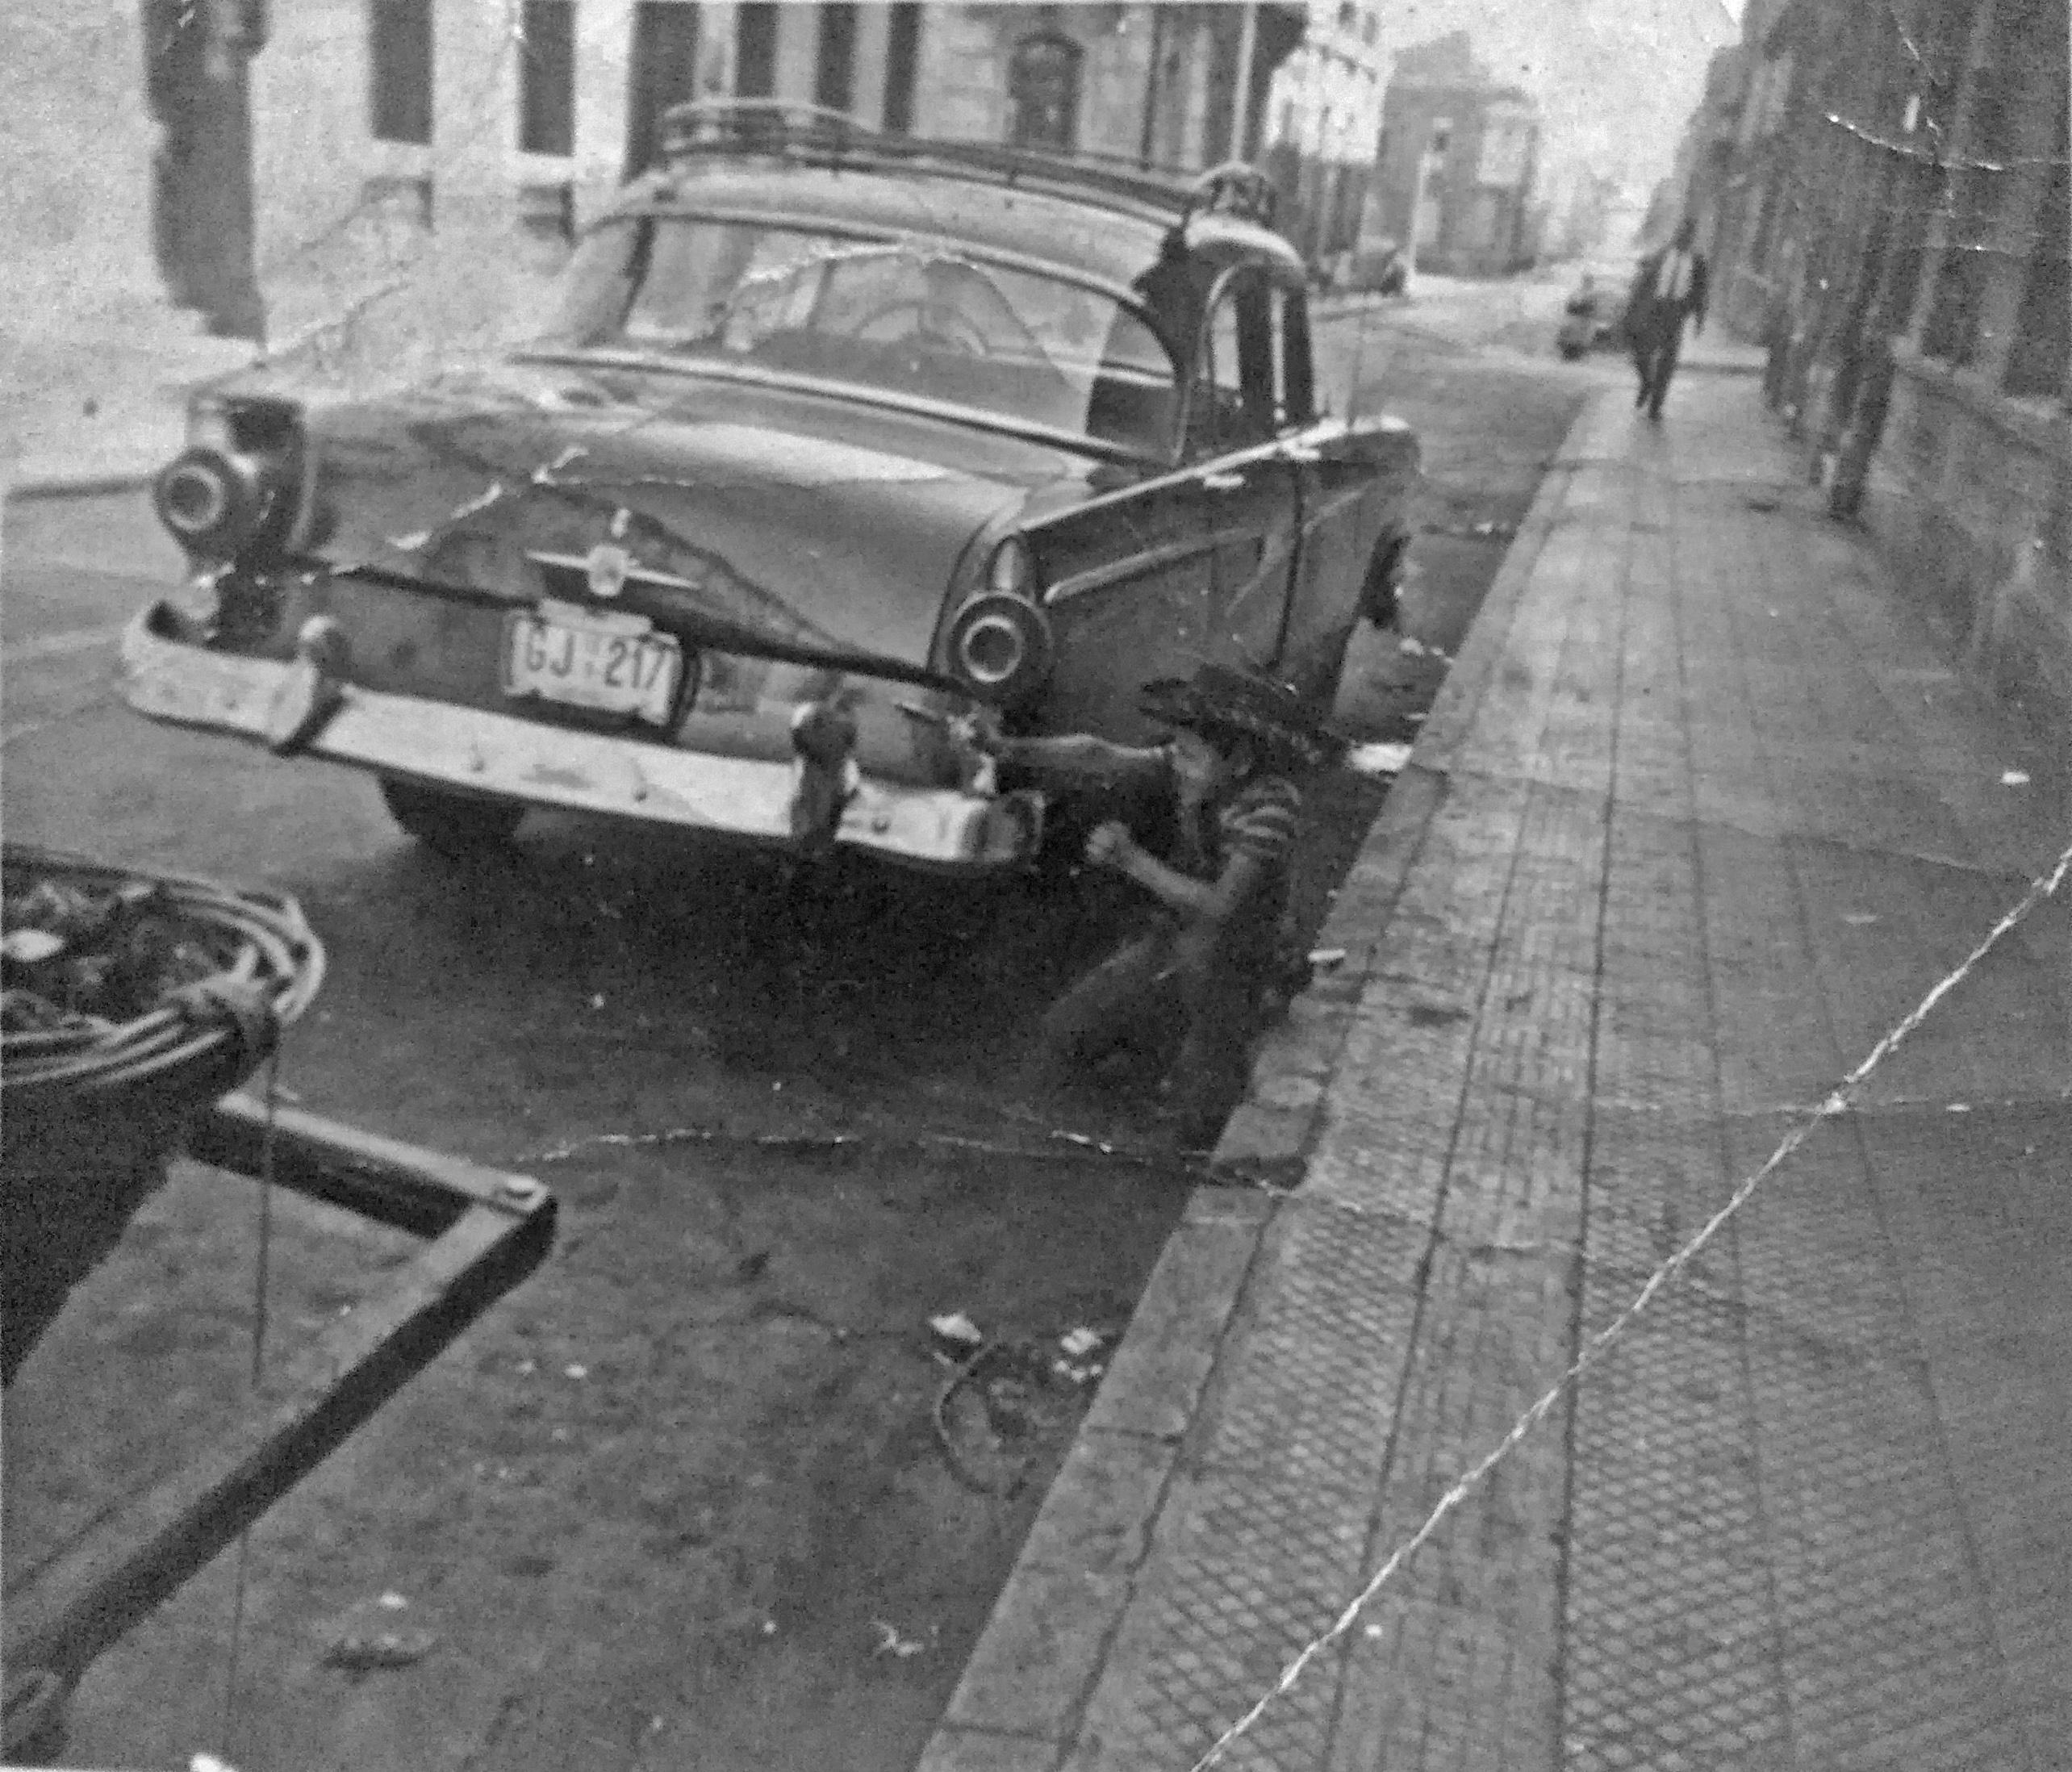 Enterreno - Fotos históricas de chile - fotos antiguas de Chile - Juego de Vaqueros en calle Huérfanos de Santiago, 1963